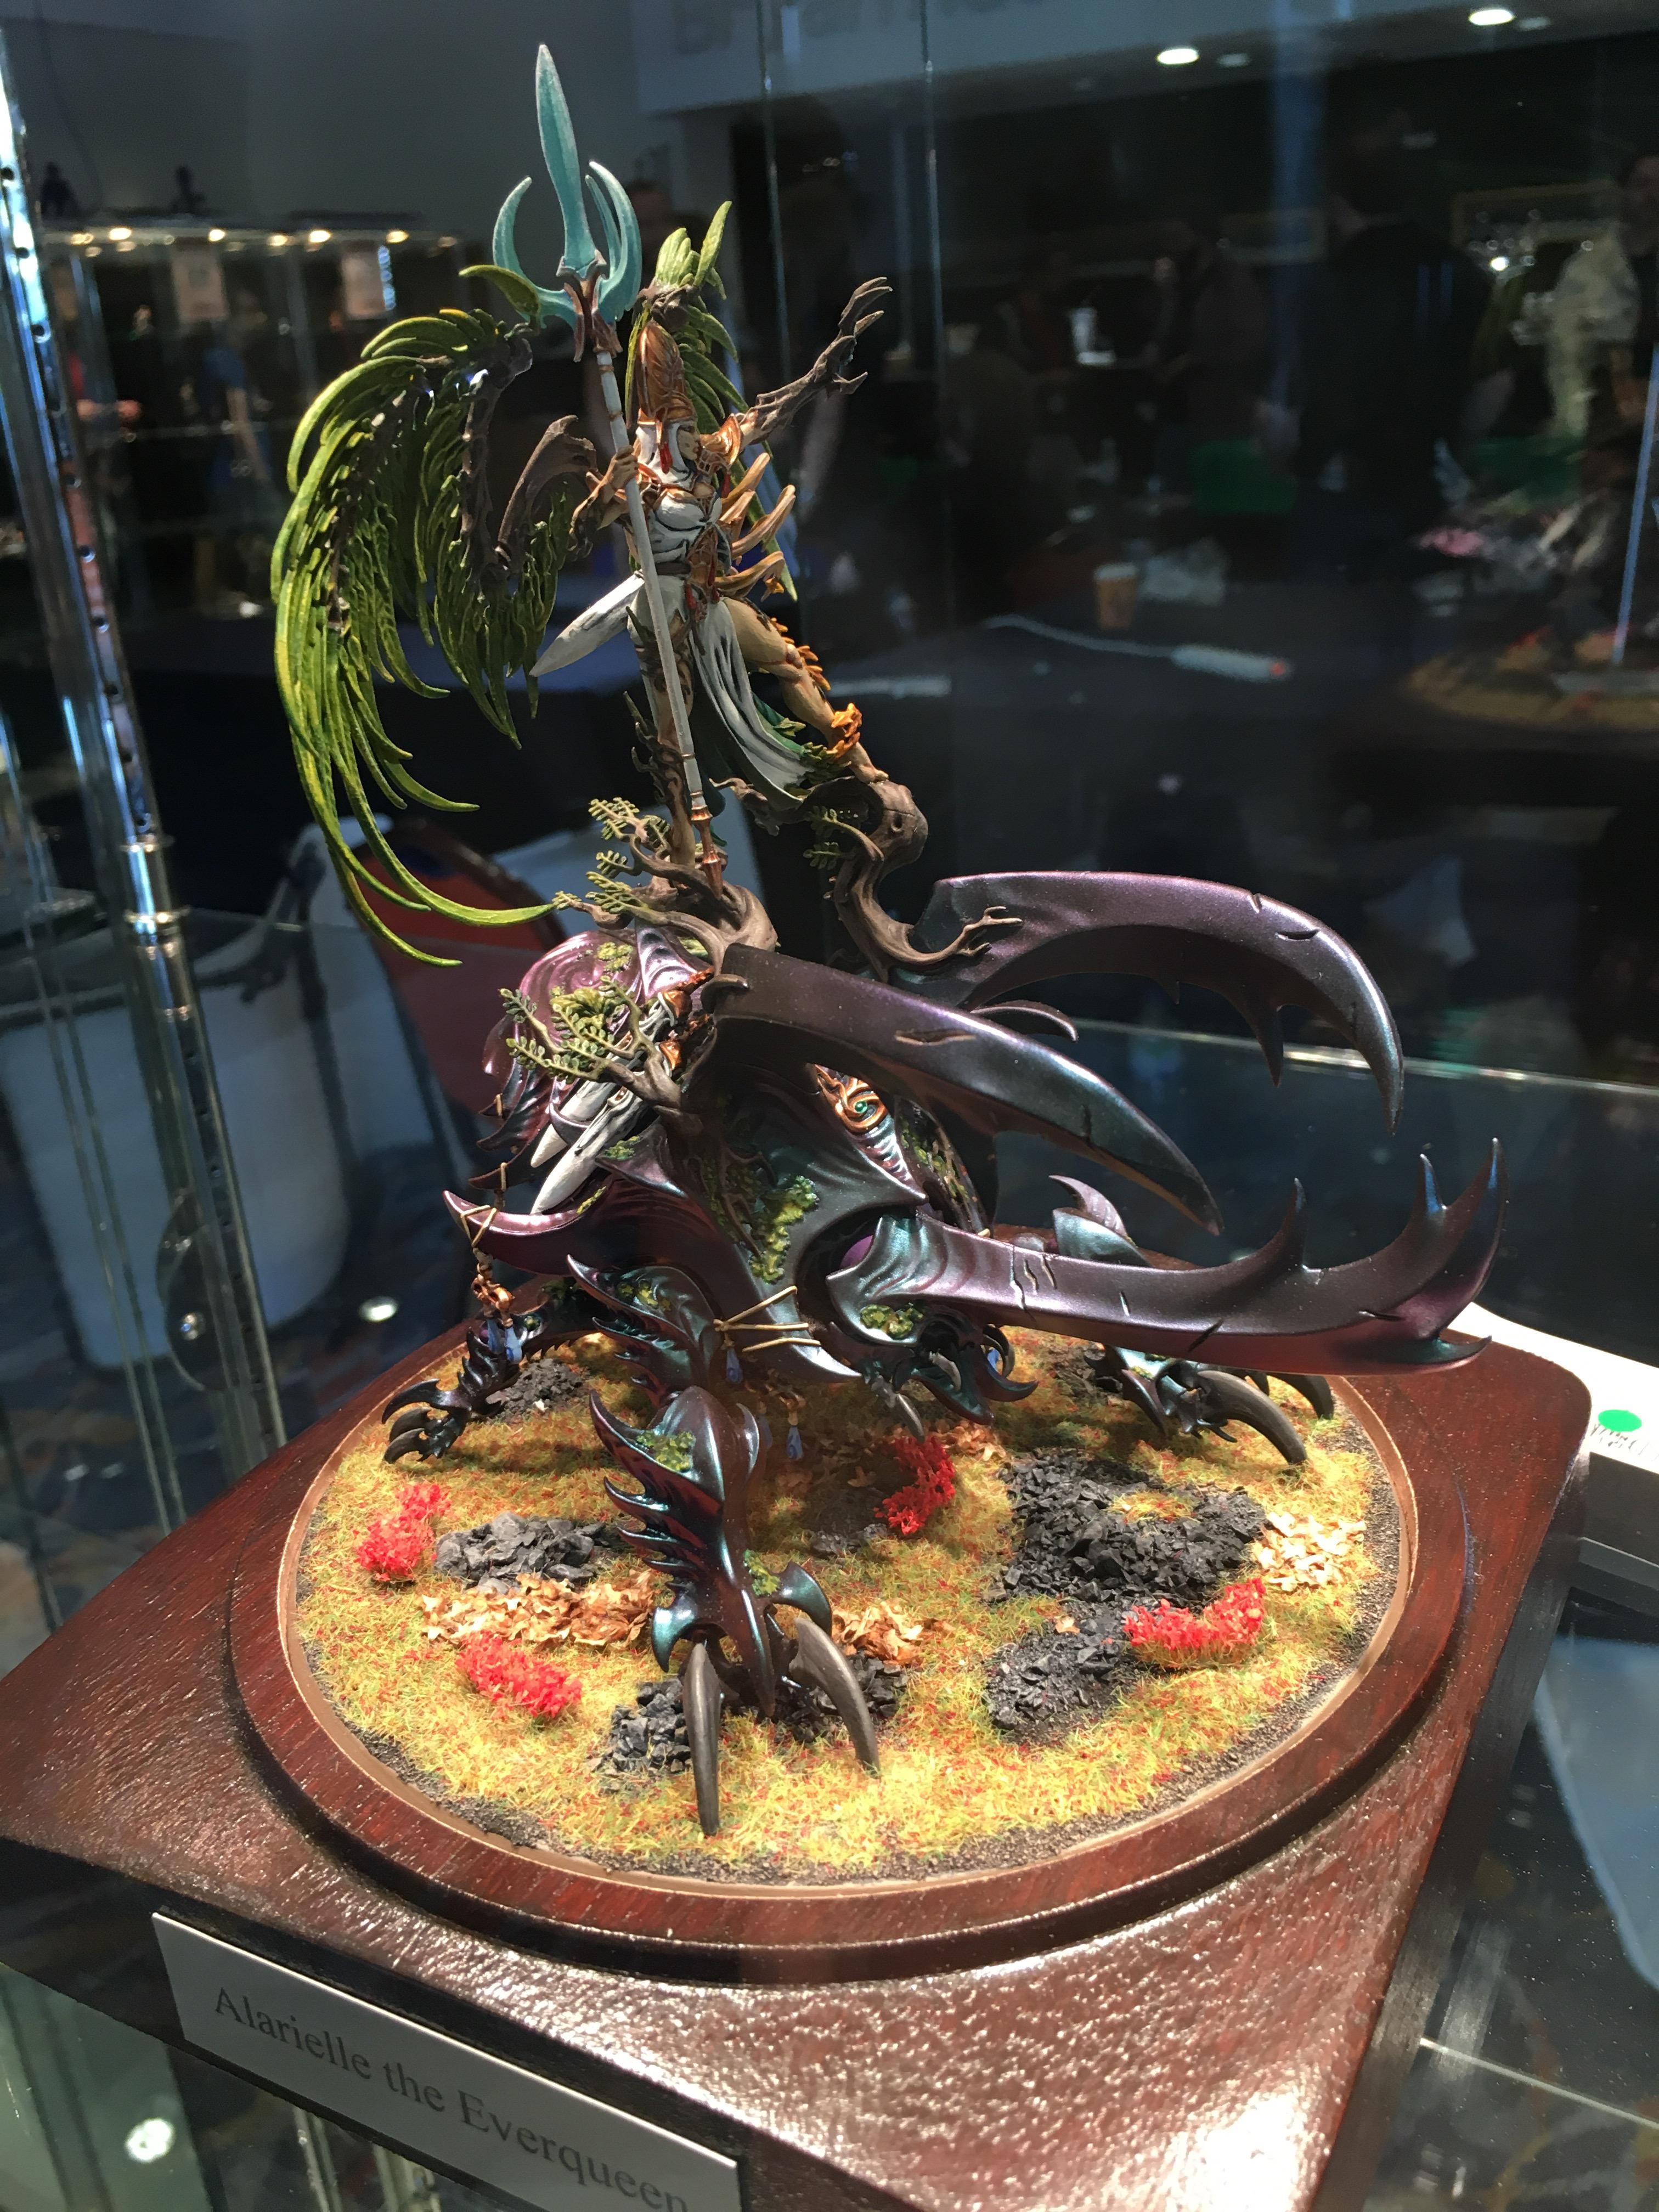 Golden Demon 2017 a Warhammer Large Monster